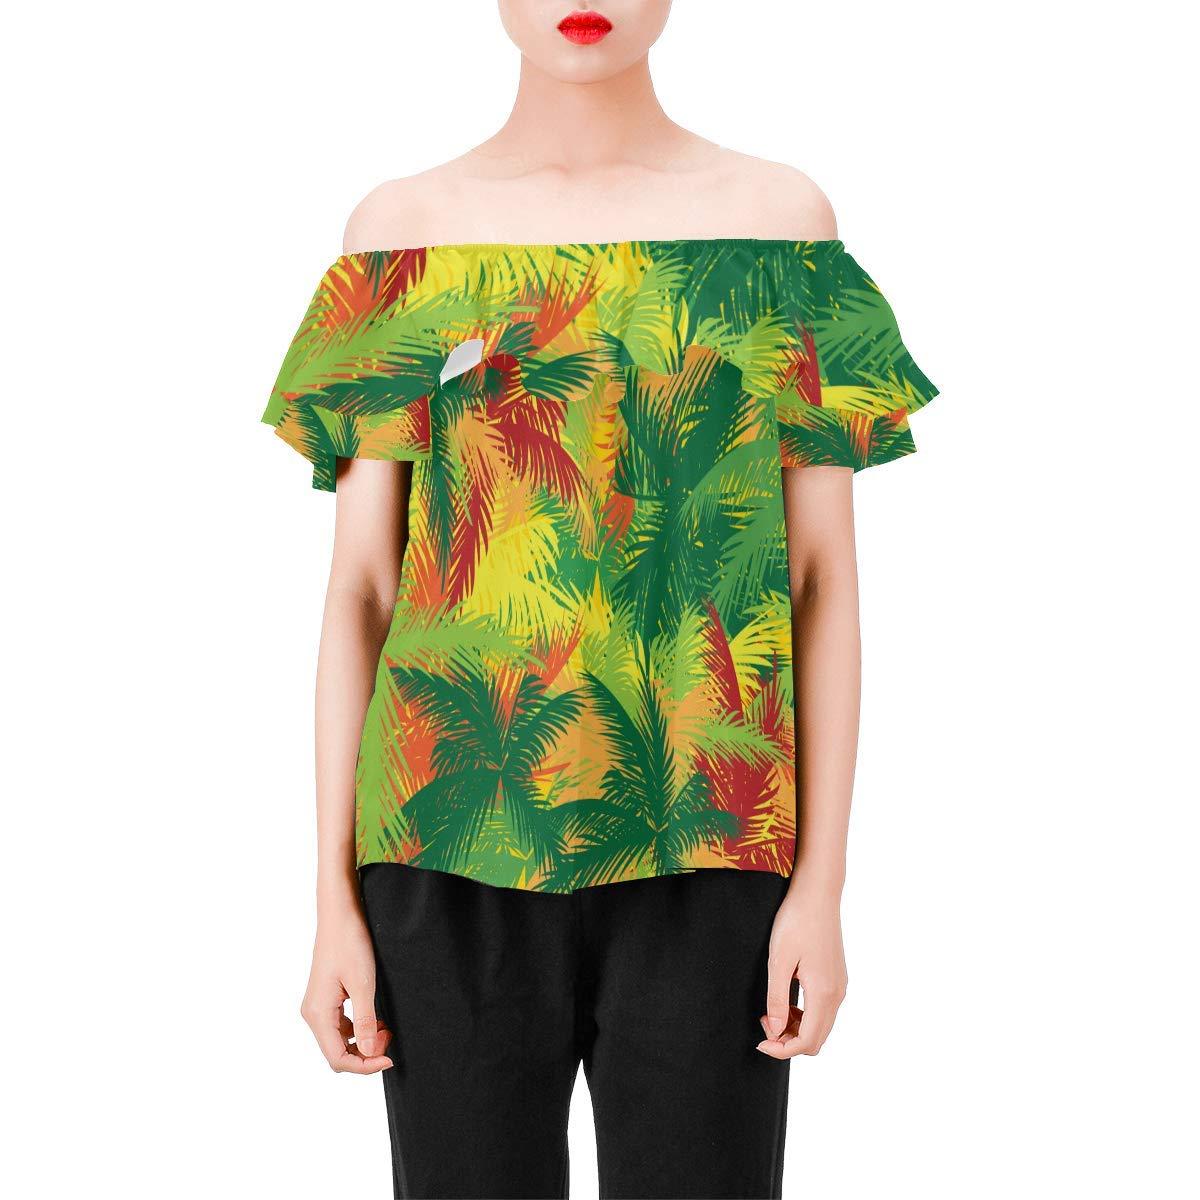 Tropical Floral Print Womens A-Line Chiffon Blouse Shirt Tops